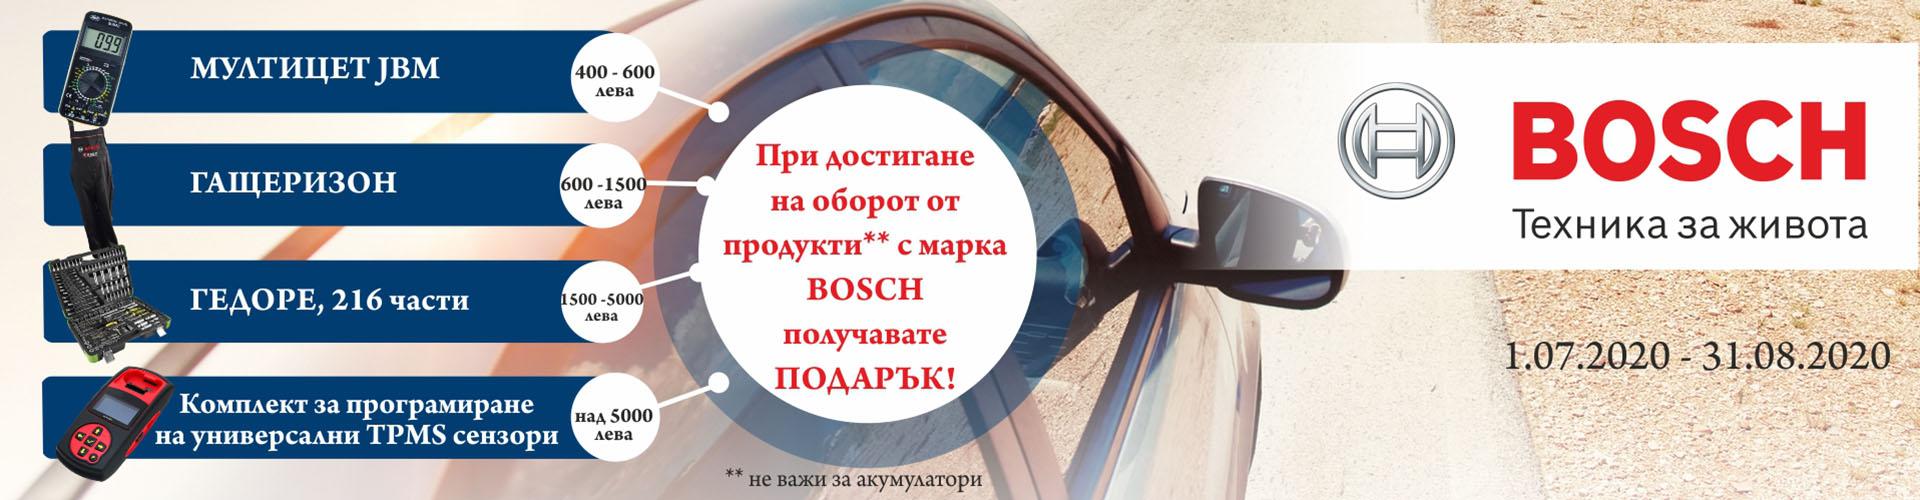 promo_bosch_01.07.2020-31.08.2020_banner.jpg